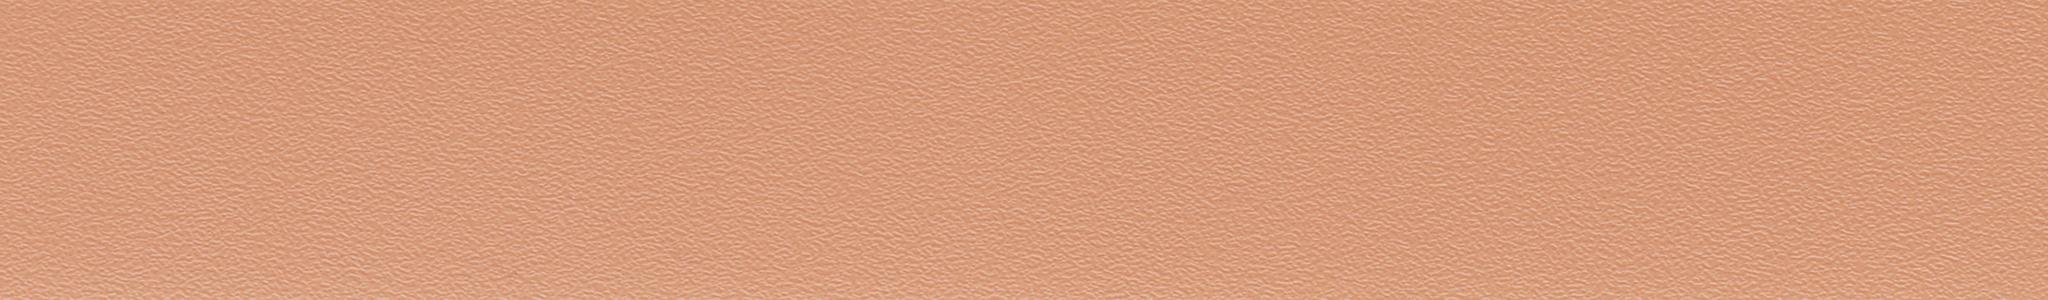 HU 18830 ABS Edge Brown Pearl XG